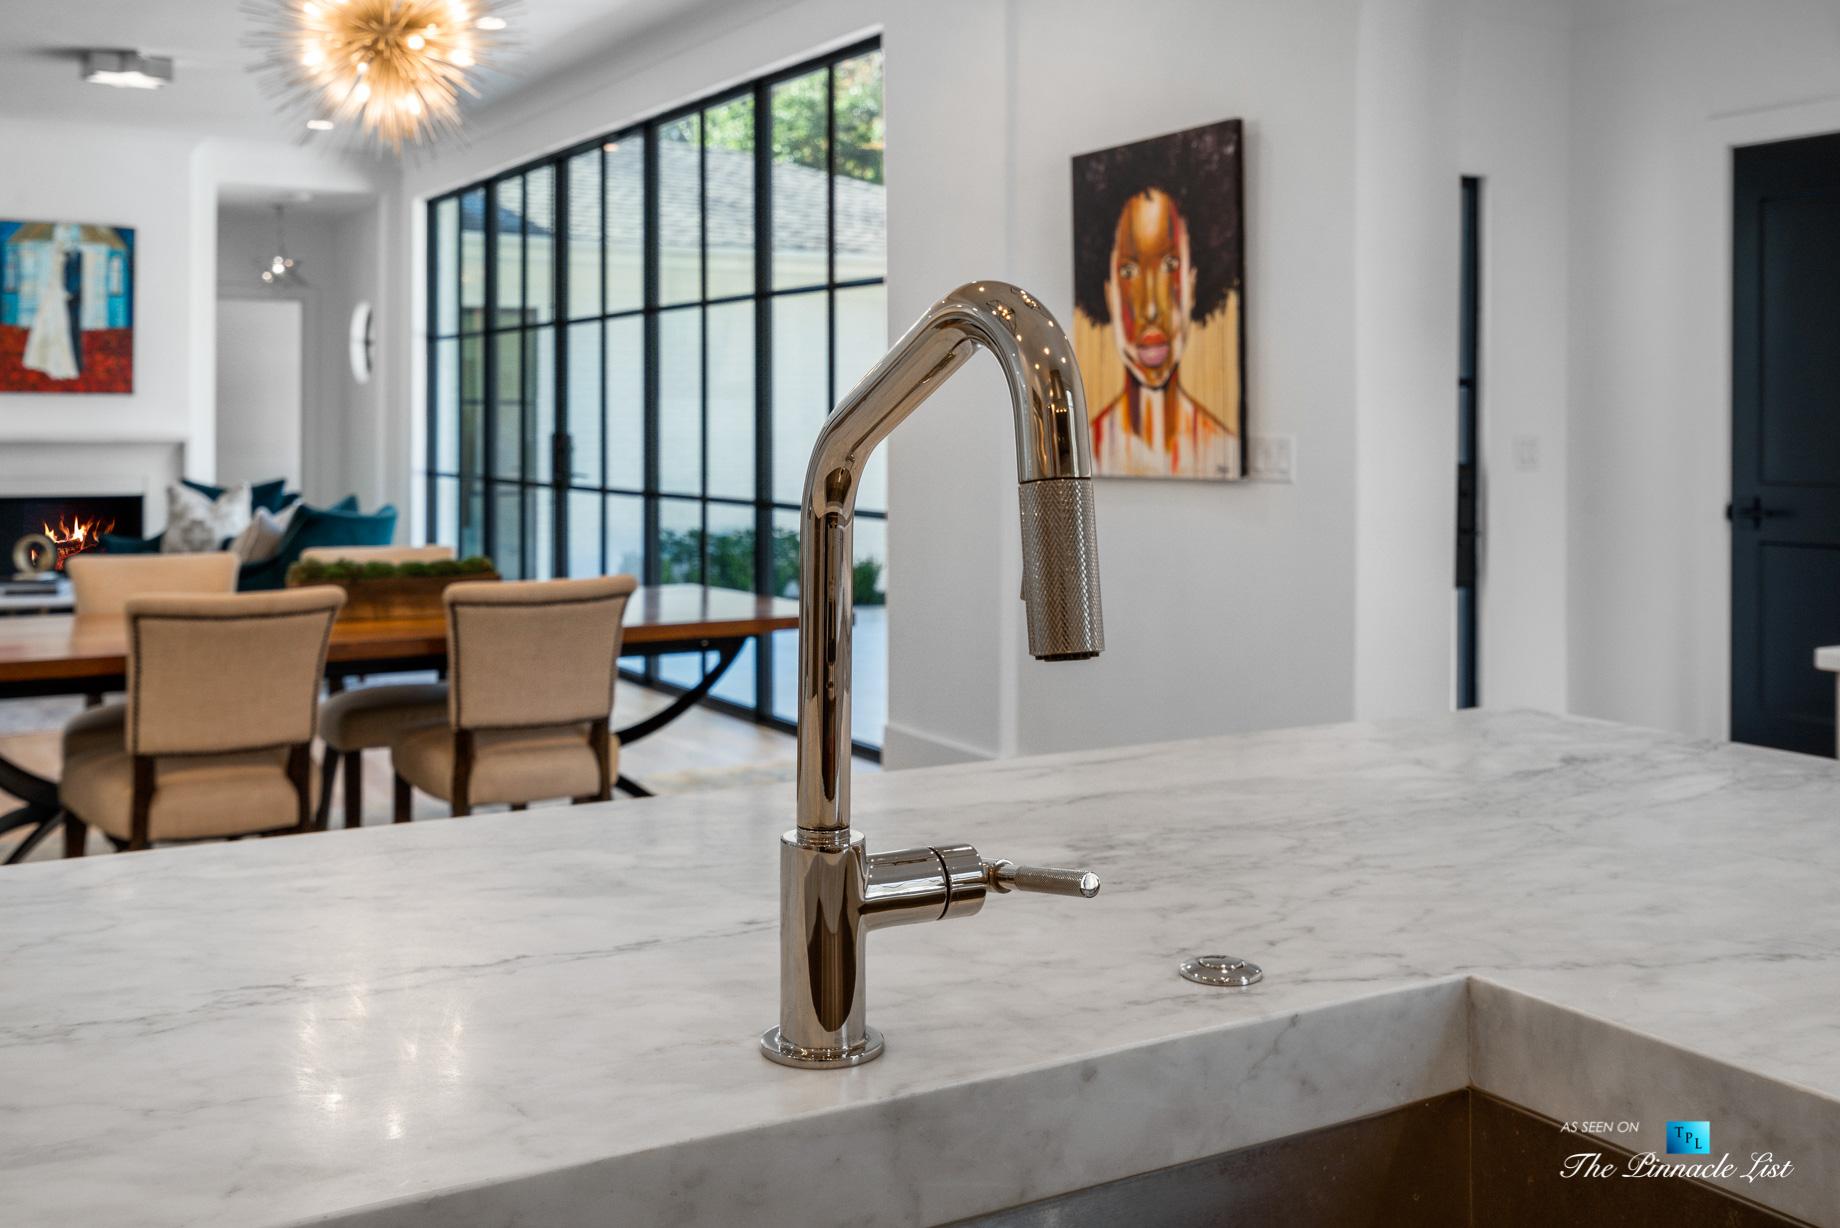 447 Valley Rd NW, Atlanta, GA, USA – Kitchen Faucet – Luxury Real Estate – Tuxedo Park Home